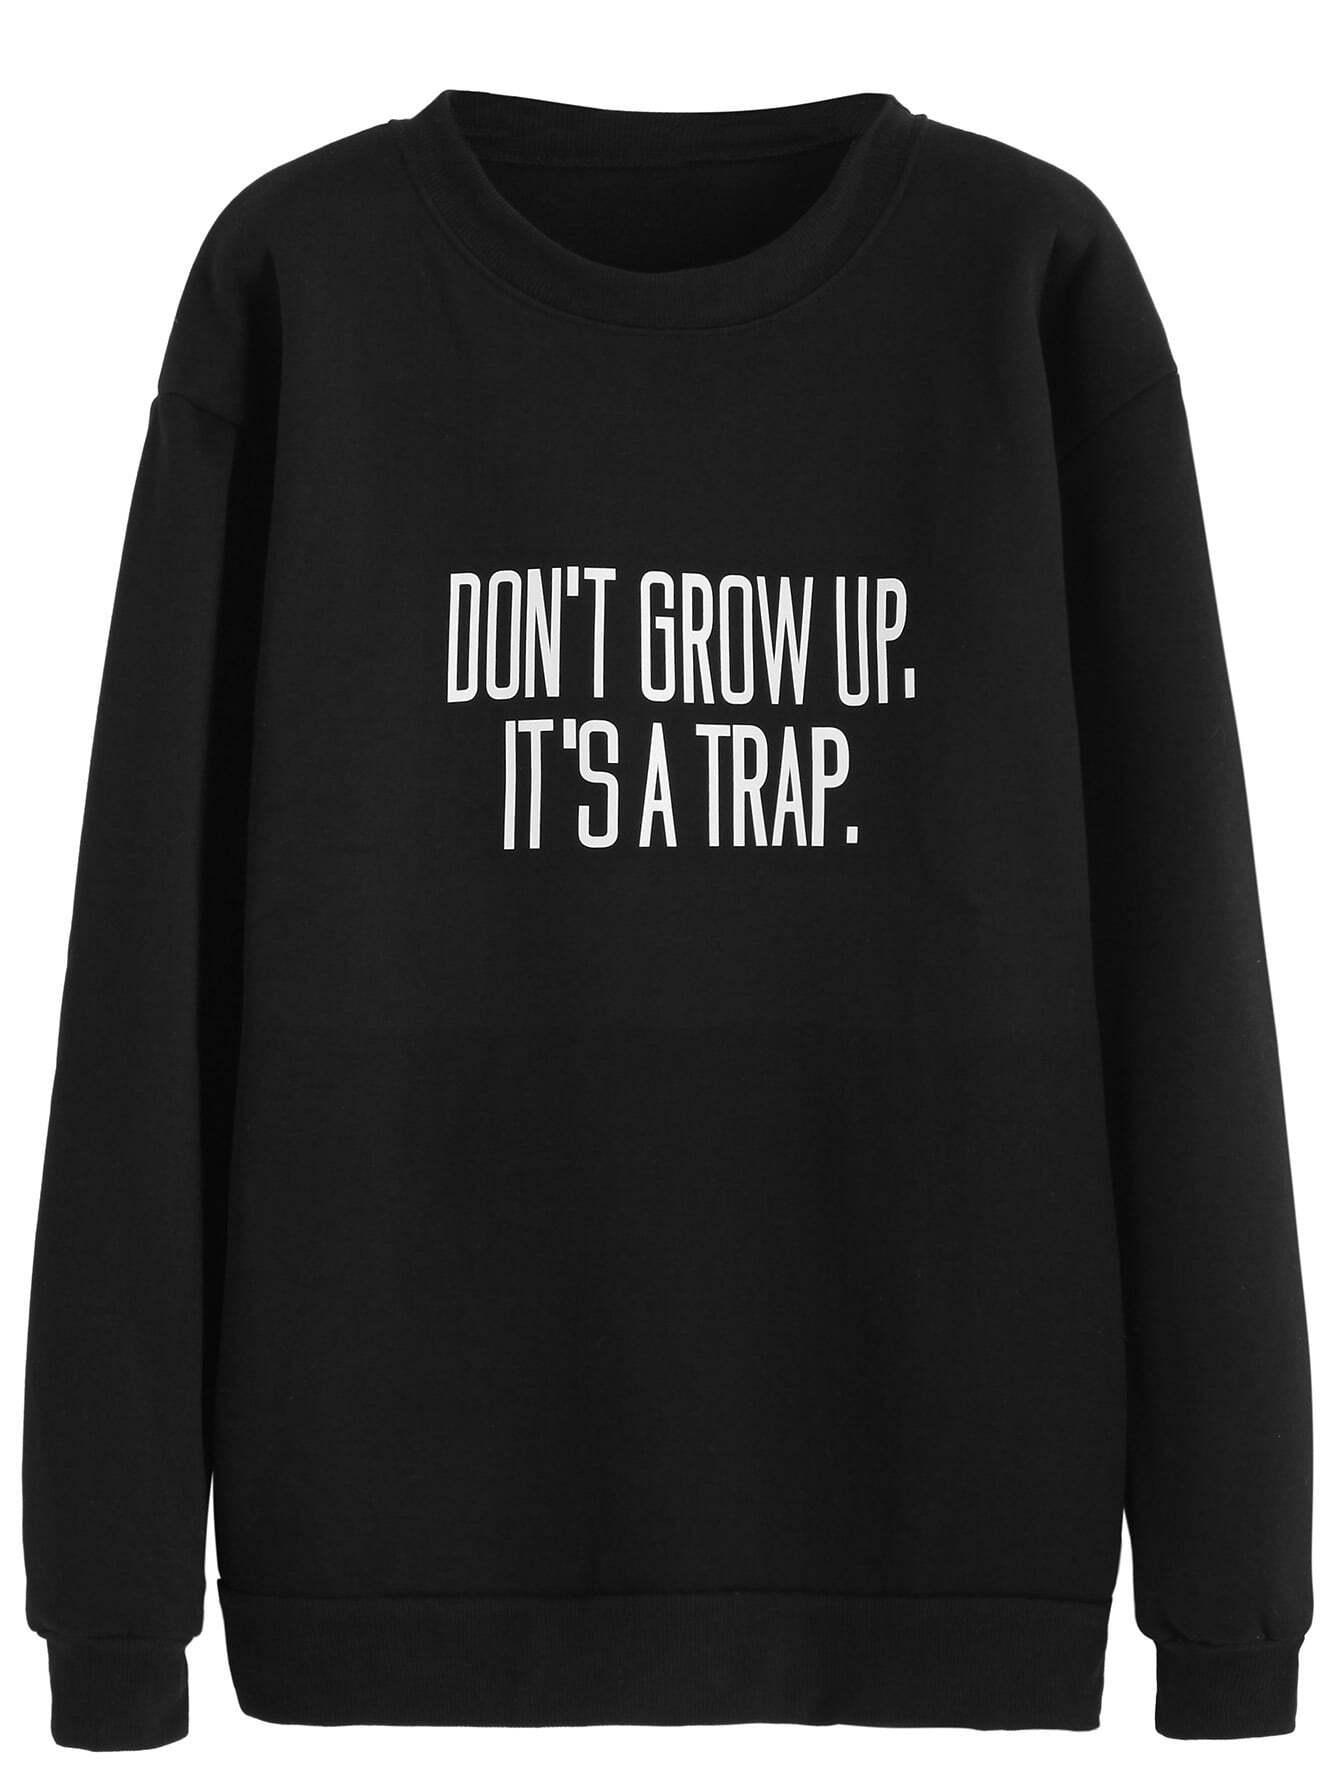 Black Slogan Print SweatshirtBlack Slogan Print Sweatshirt<br><br>color: Black<br>size: L,M,XL